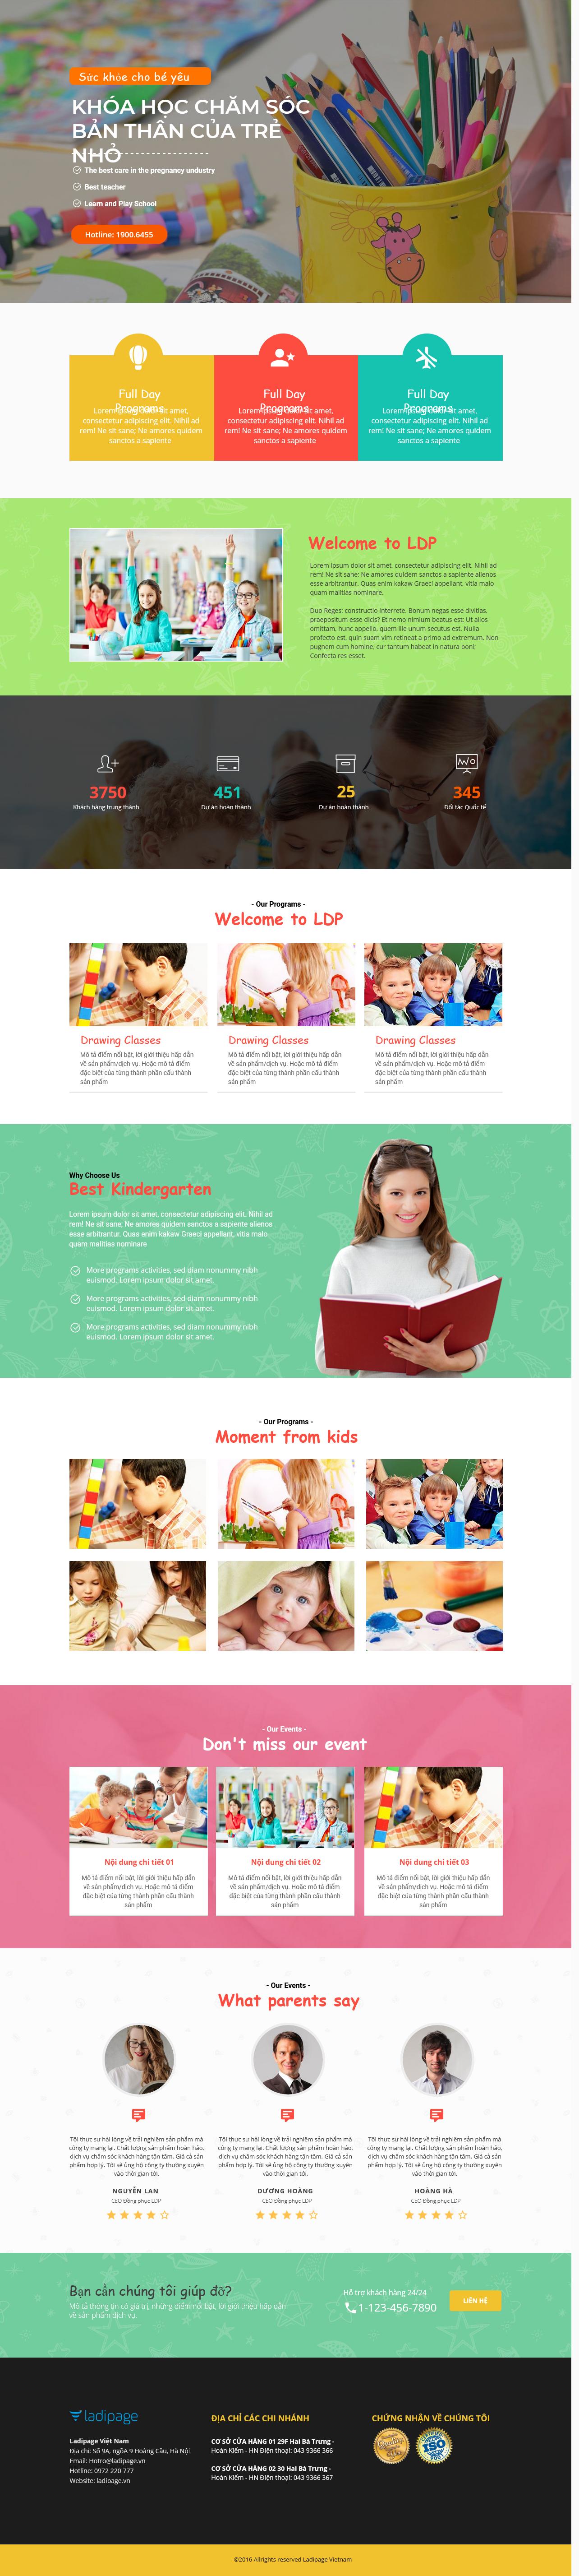 Thiết kế website Thiết kế webiste landingpage me---be Mẹ & Bé 07